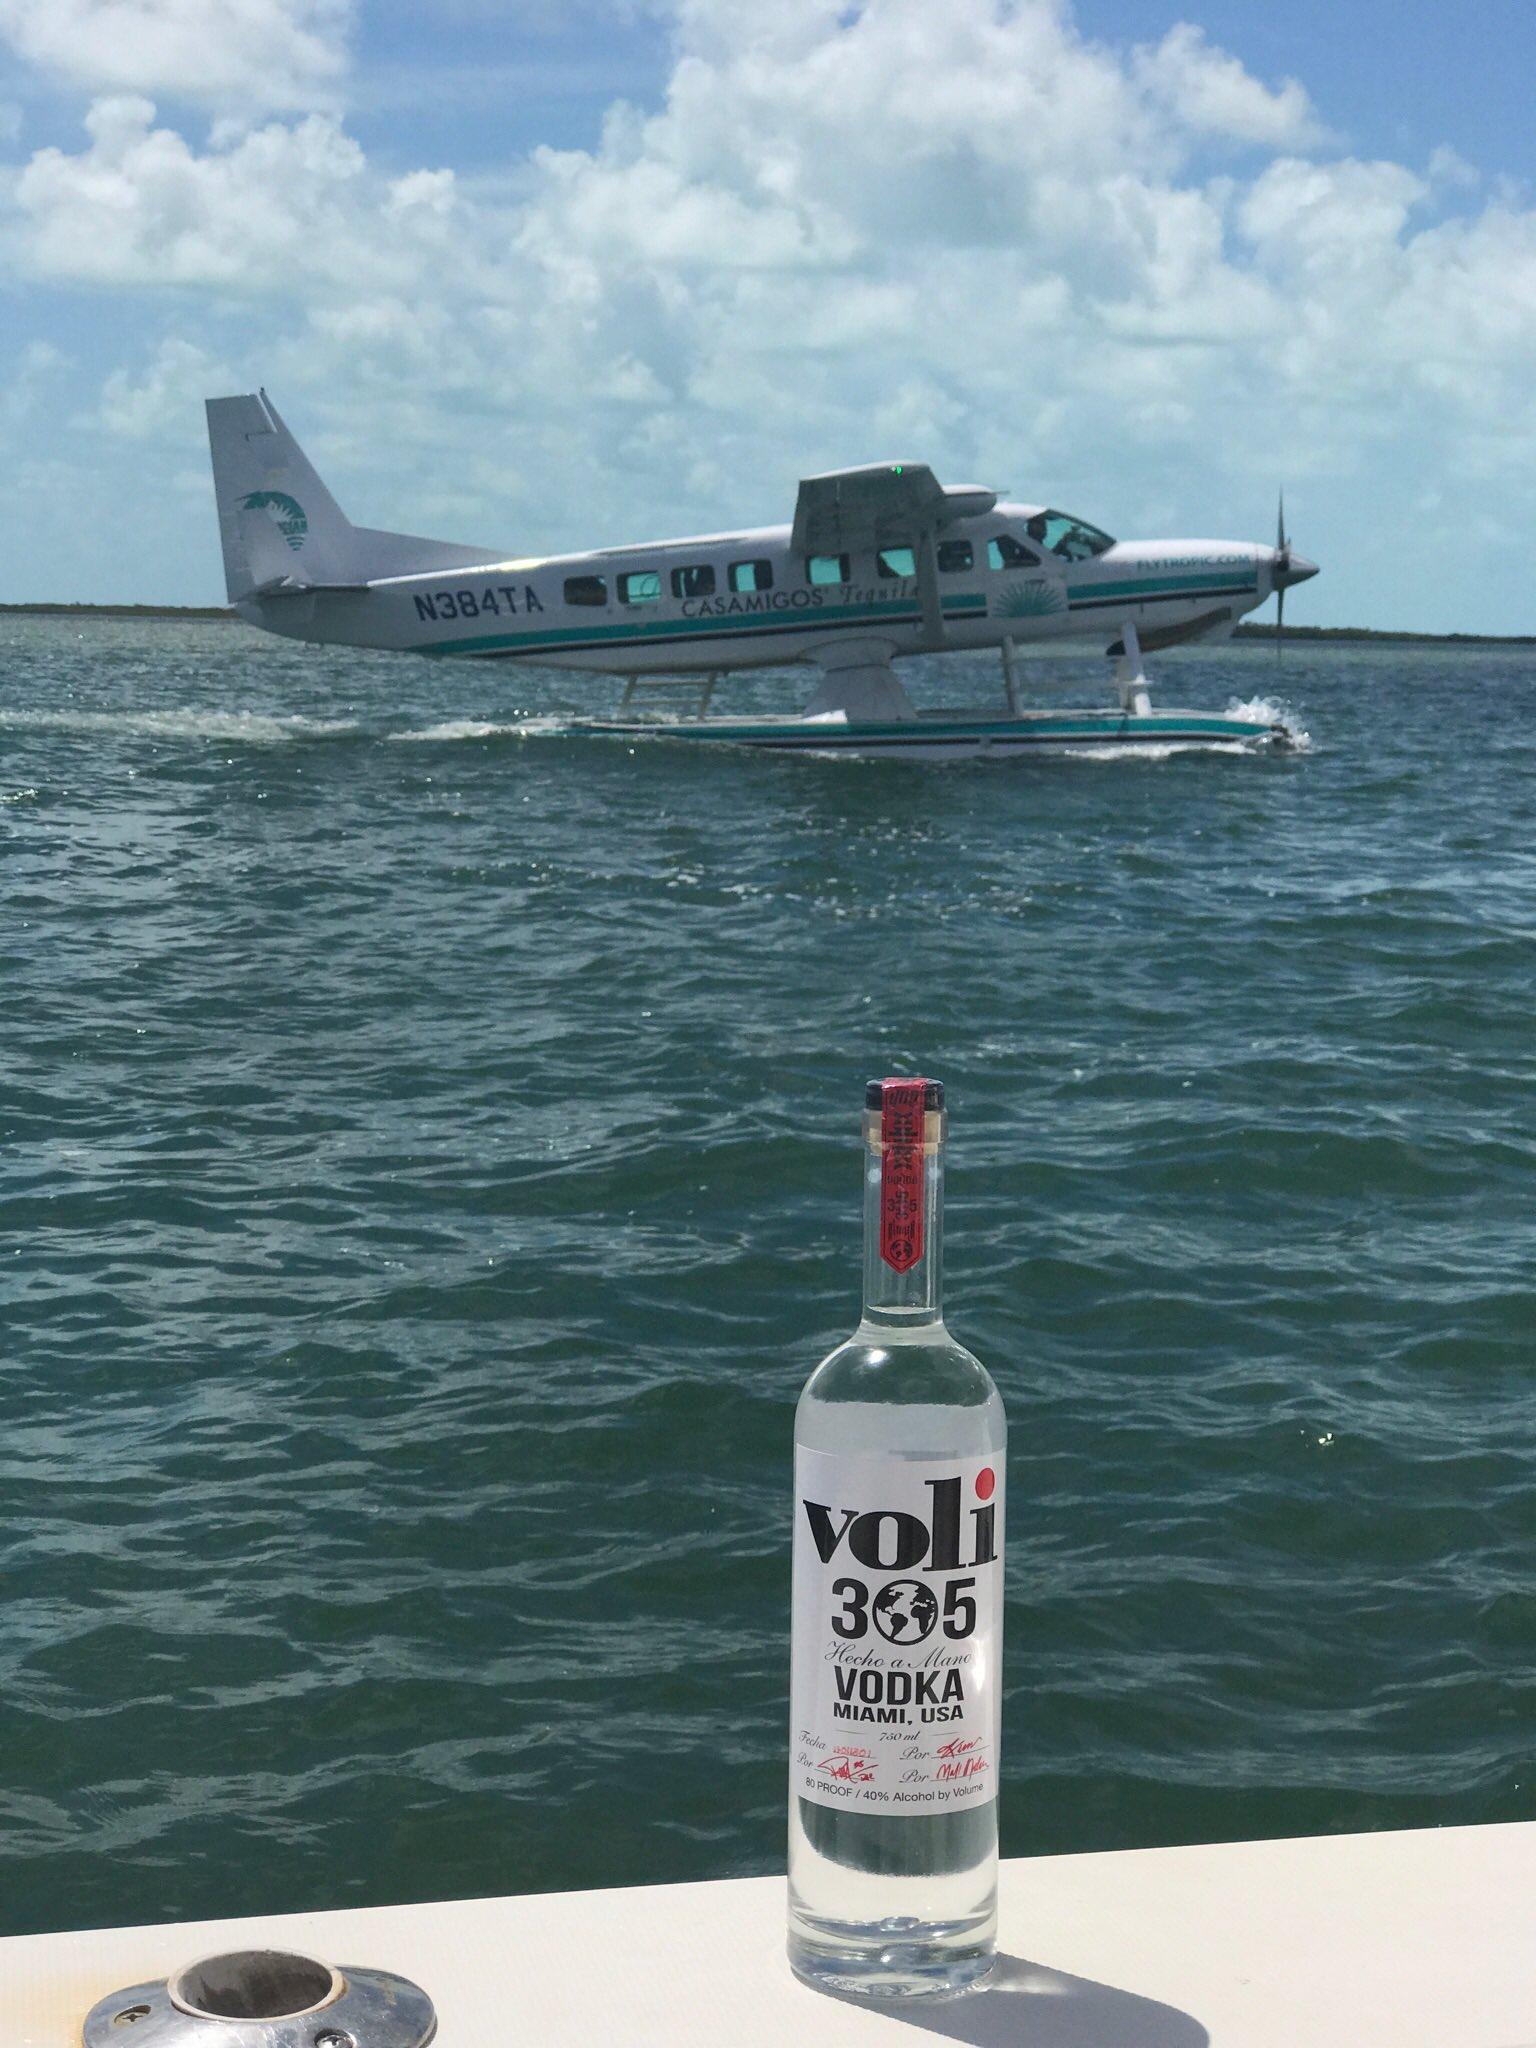 Guess who is taking off next @Voli305Vodka https://t.co/po3qGWbkLu